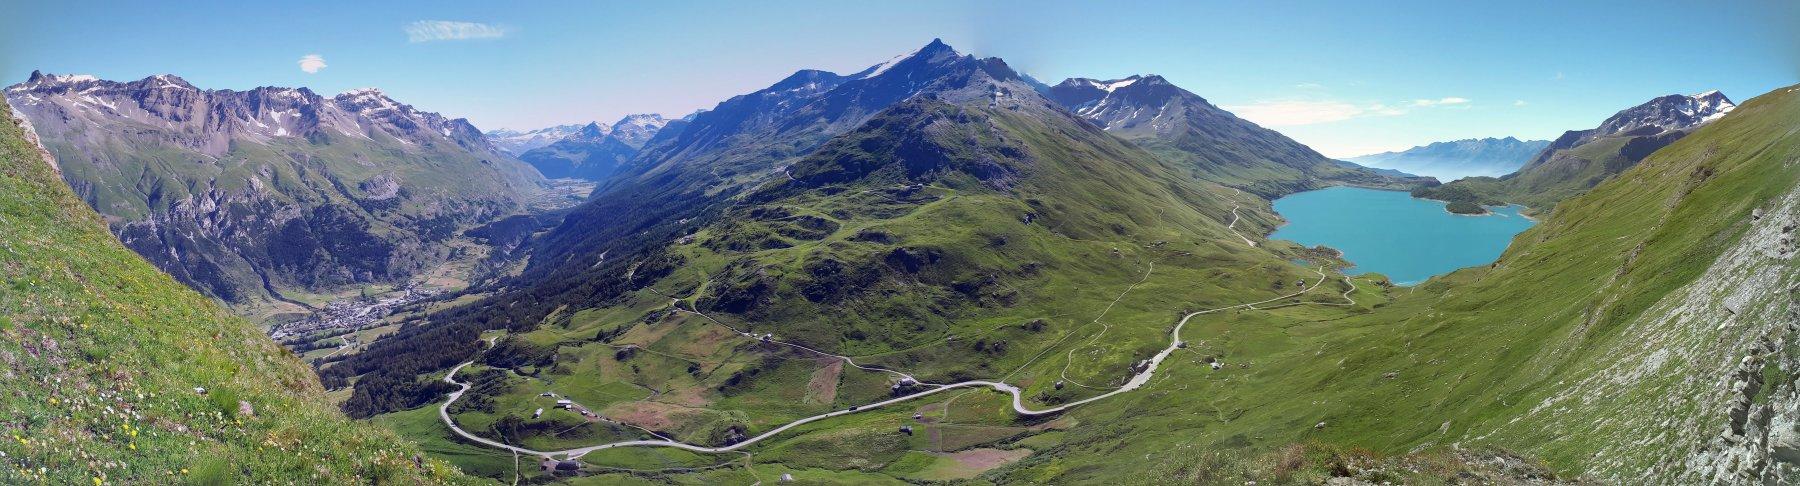 Panorama da Colle Turra